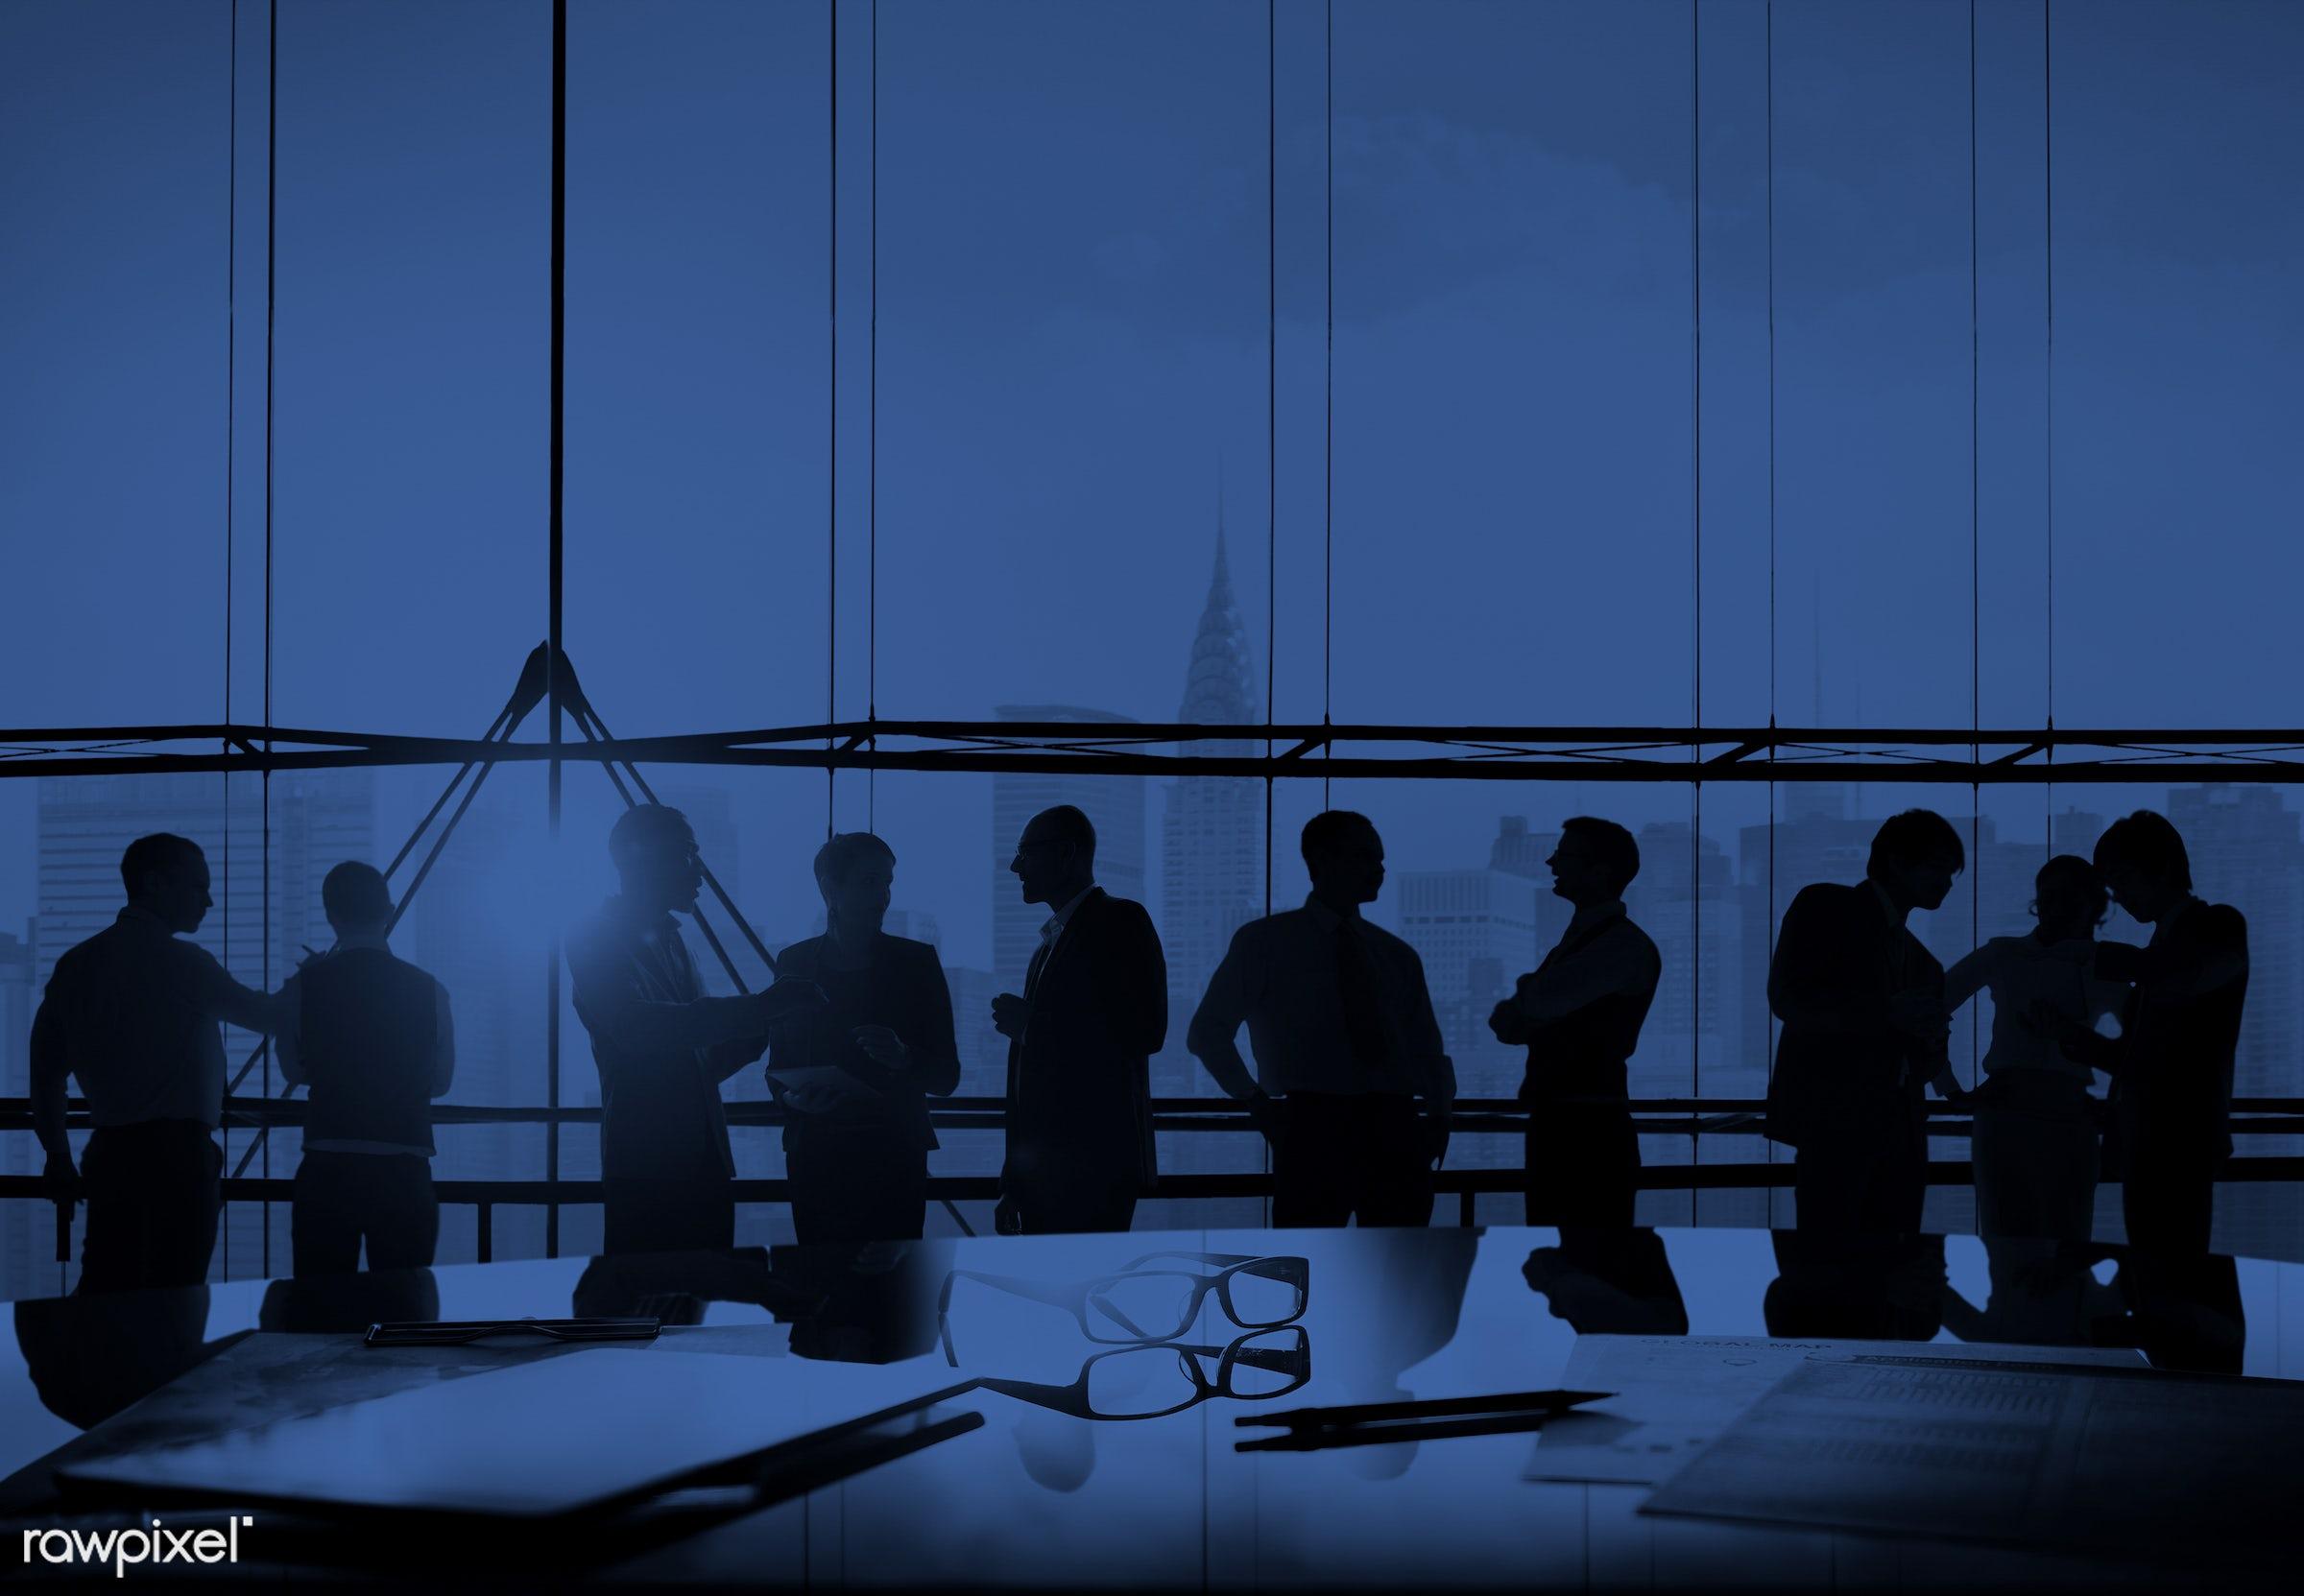 agreement, back lit, blue, board room, brainstorming, building, business, business people, businessmen, businesswomen, busy...